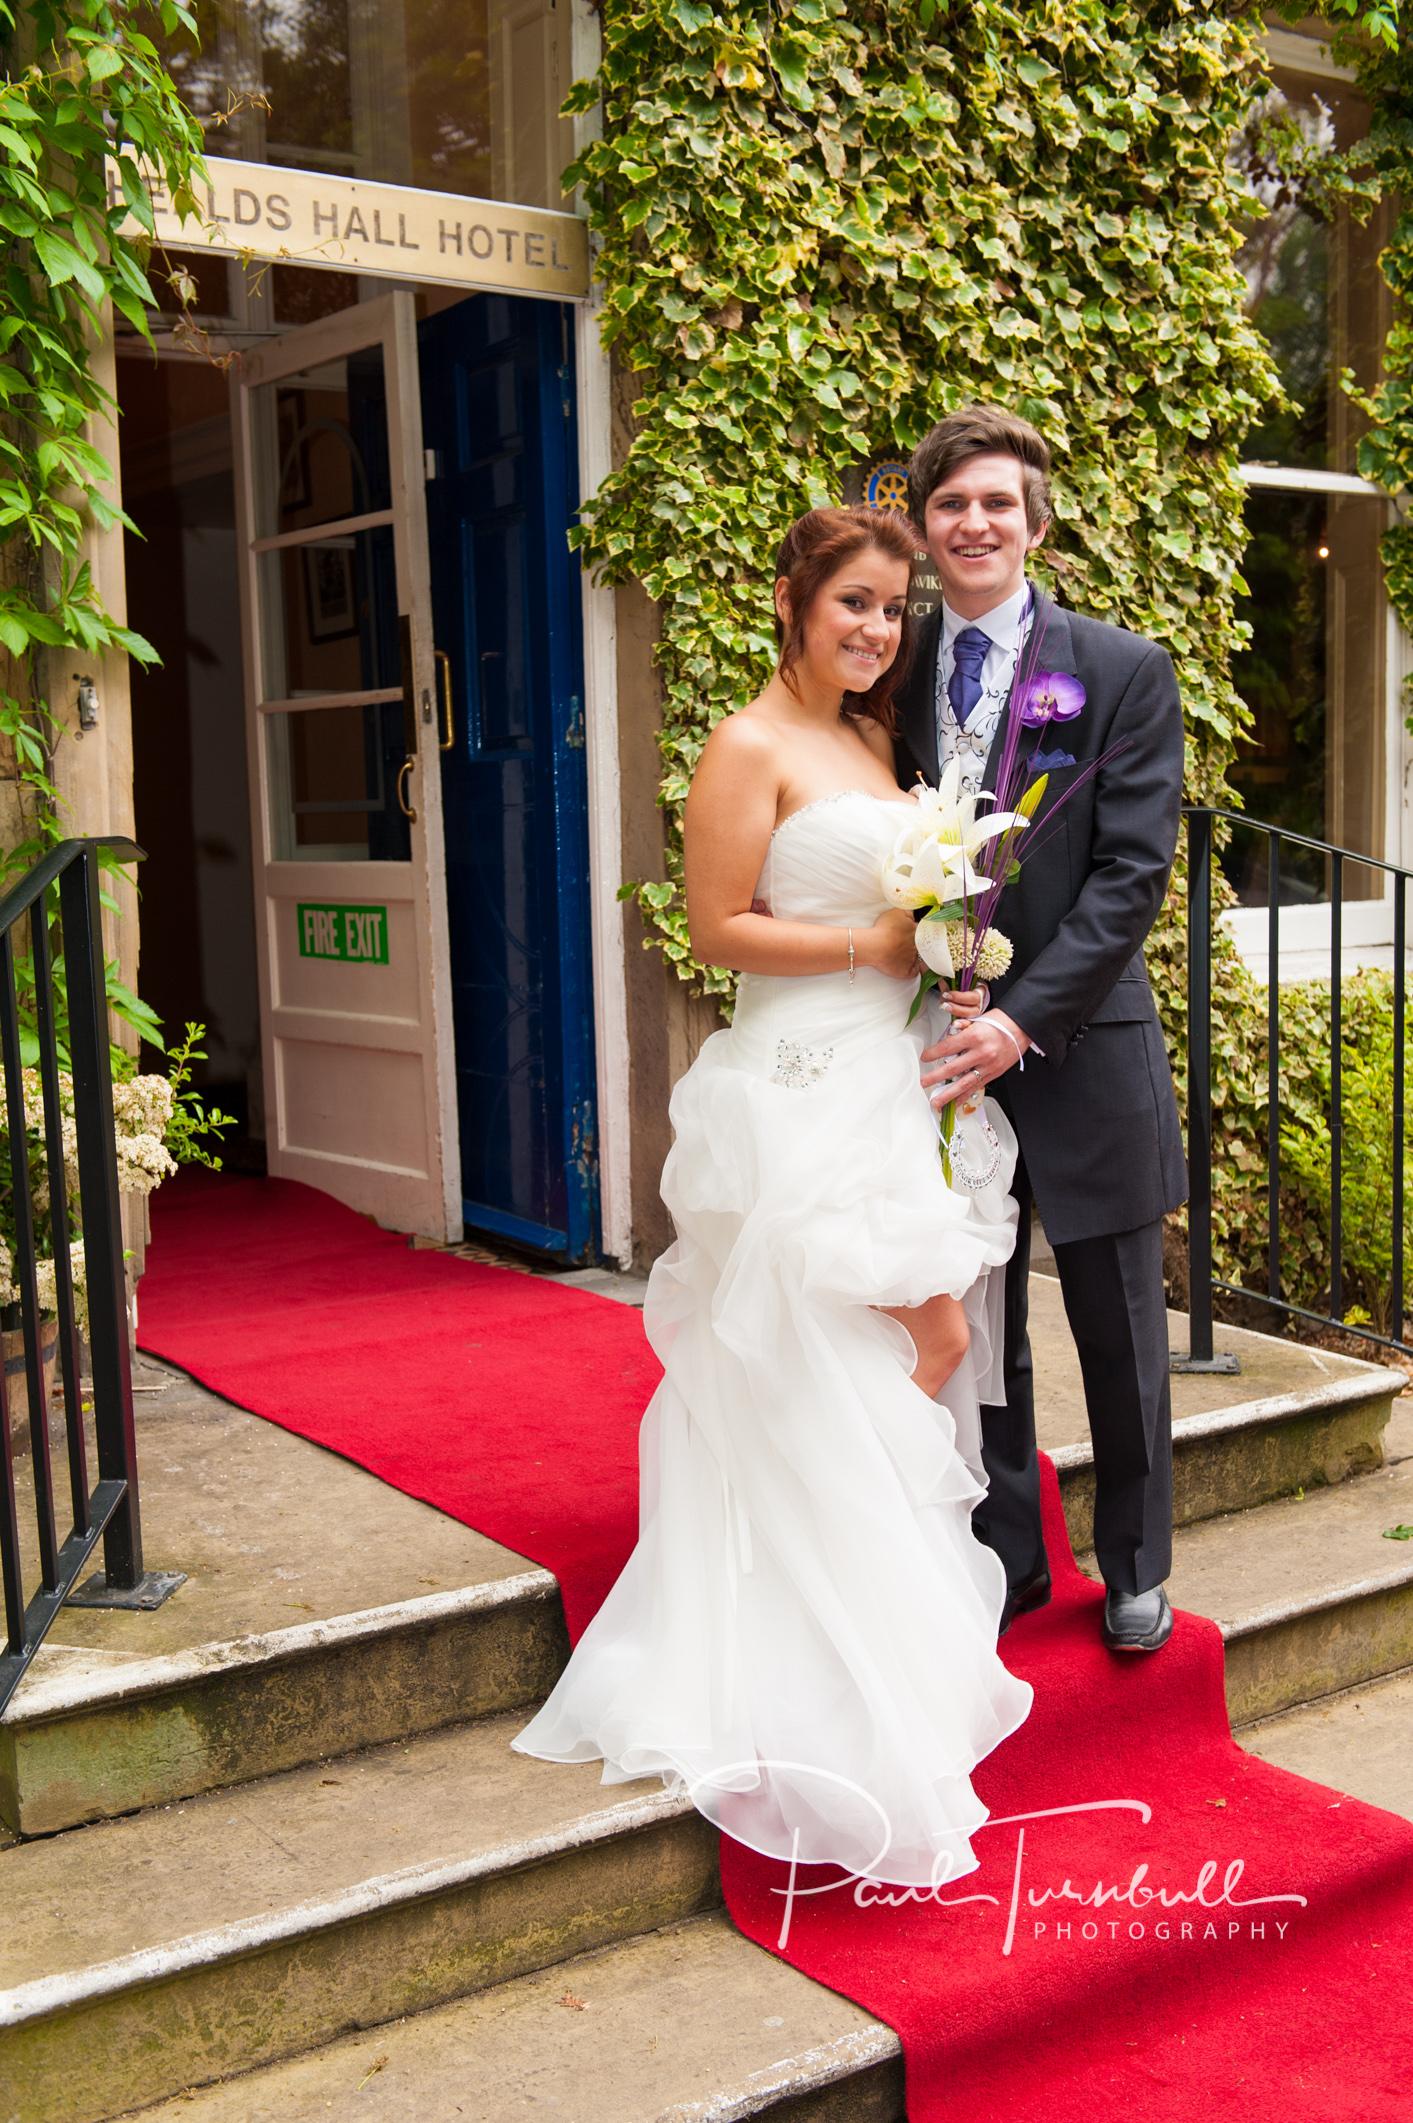 wedding-photography-healds-hall-liversedge-yorkshire-055.jpg